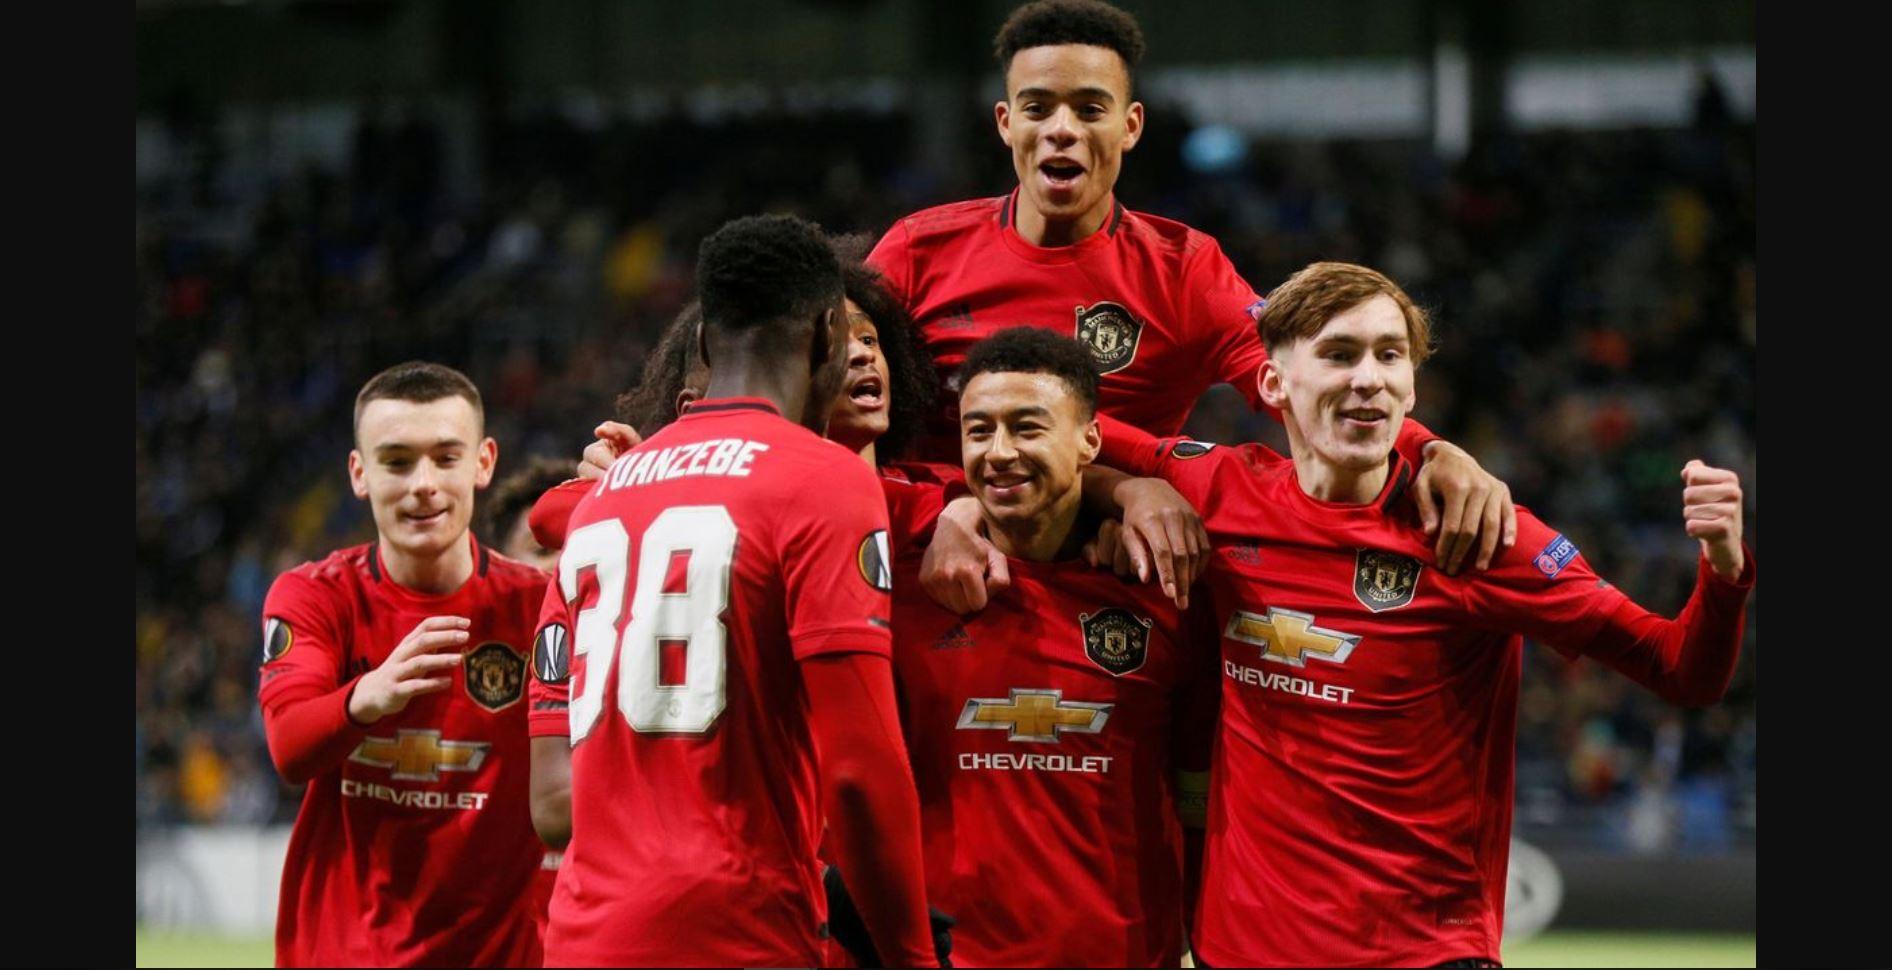 Pemain Manchester United Ini Nihil Gol Nihil Assist